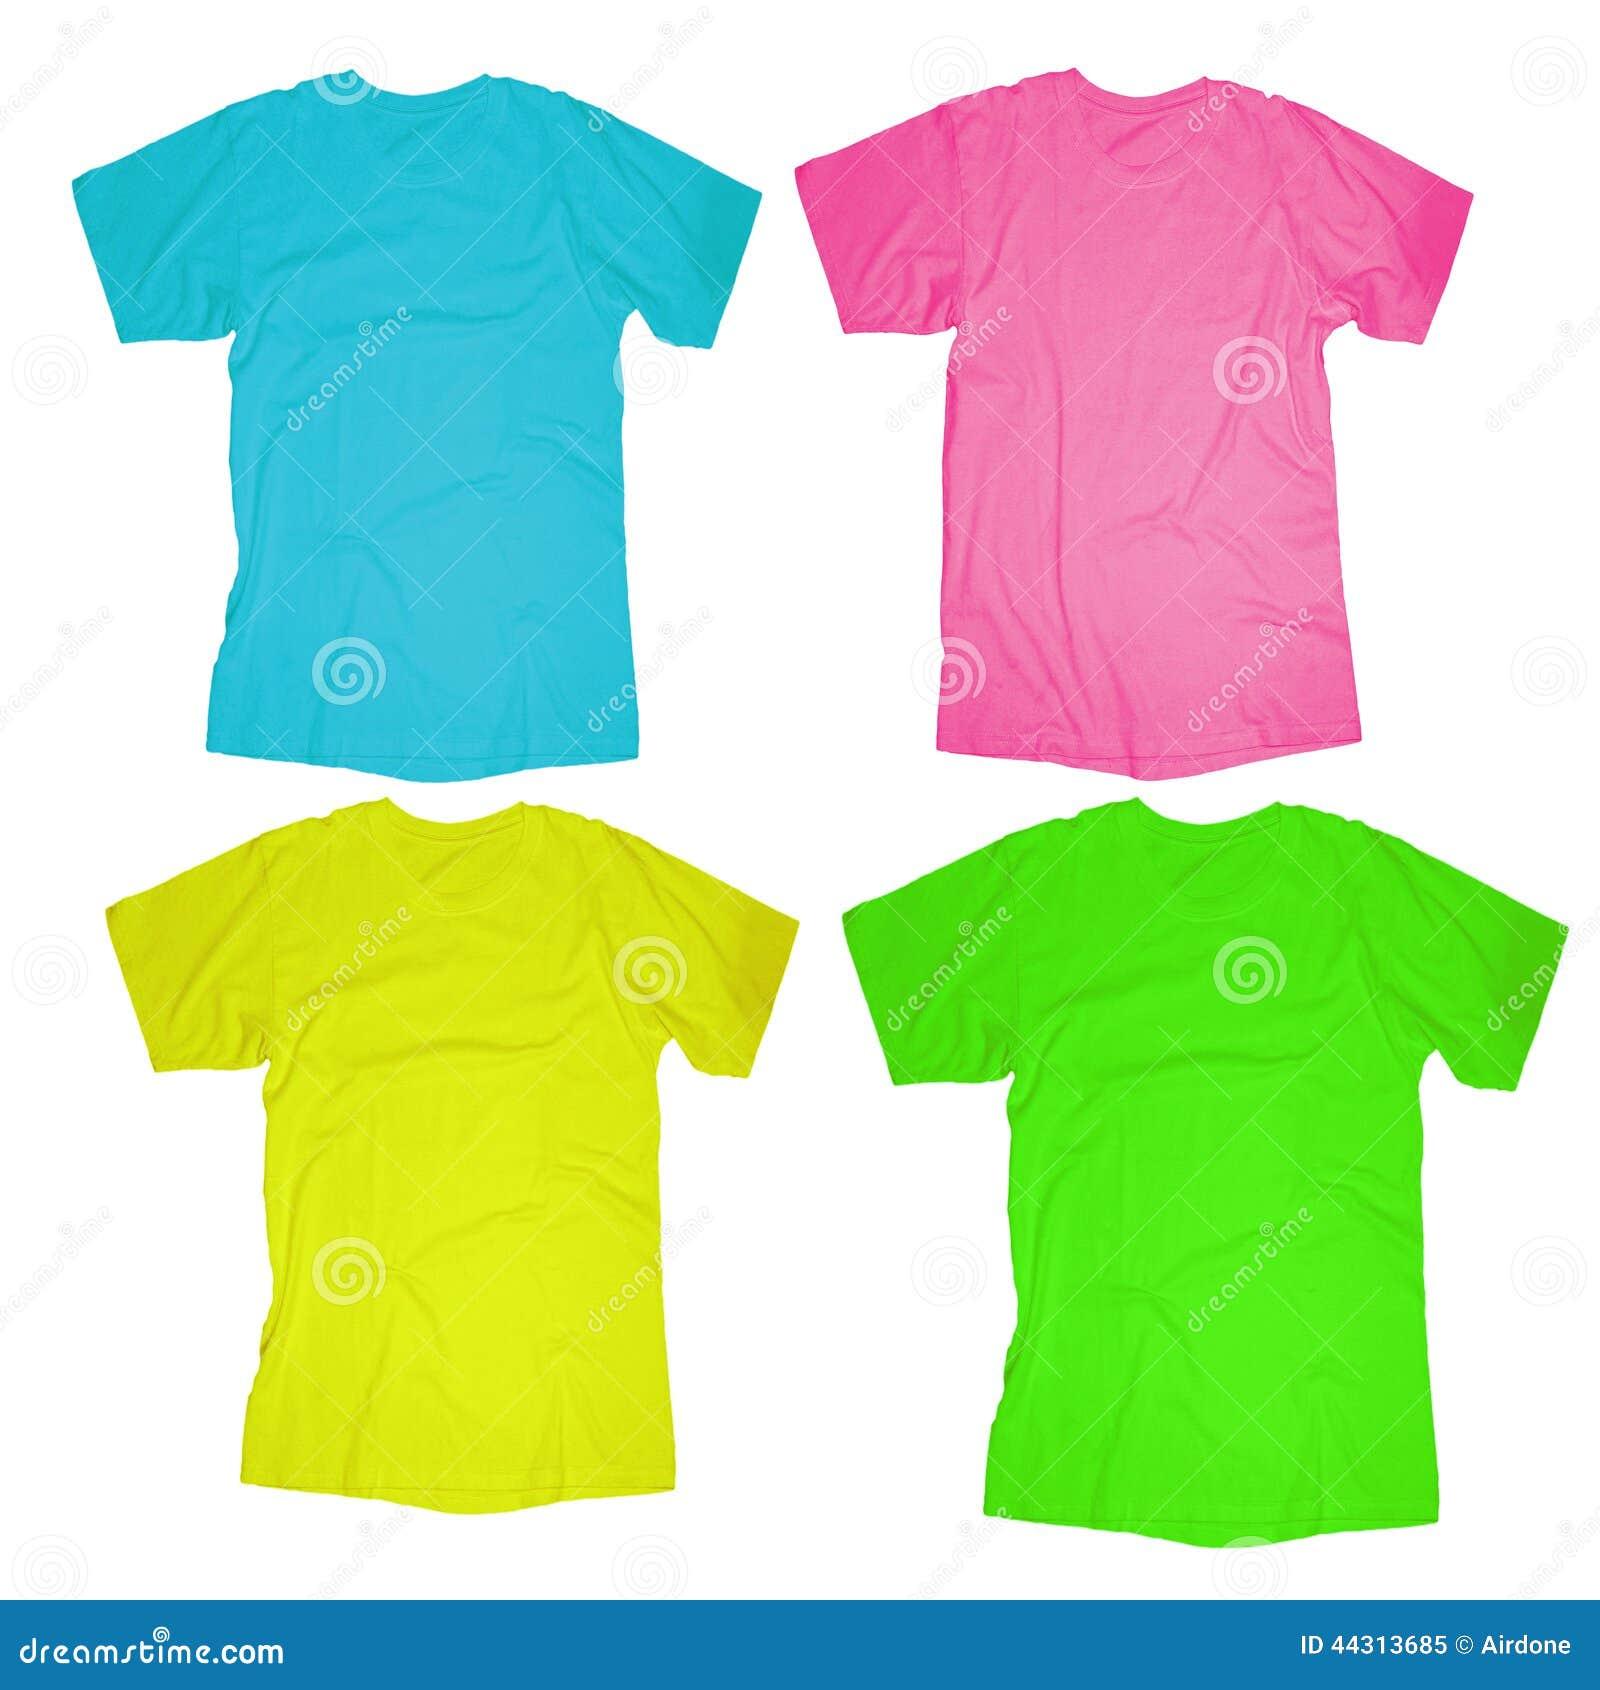 Shirt design green - Blank T Shirt Template Royalty Free Stock Photo